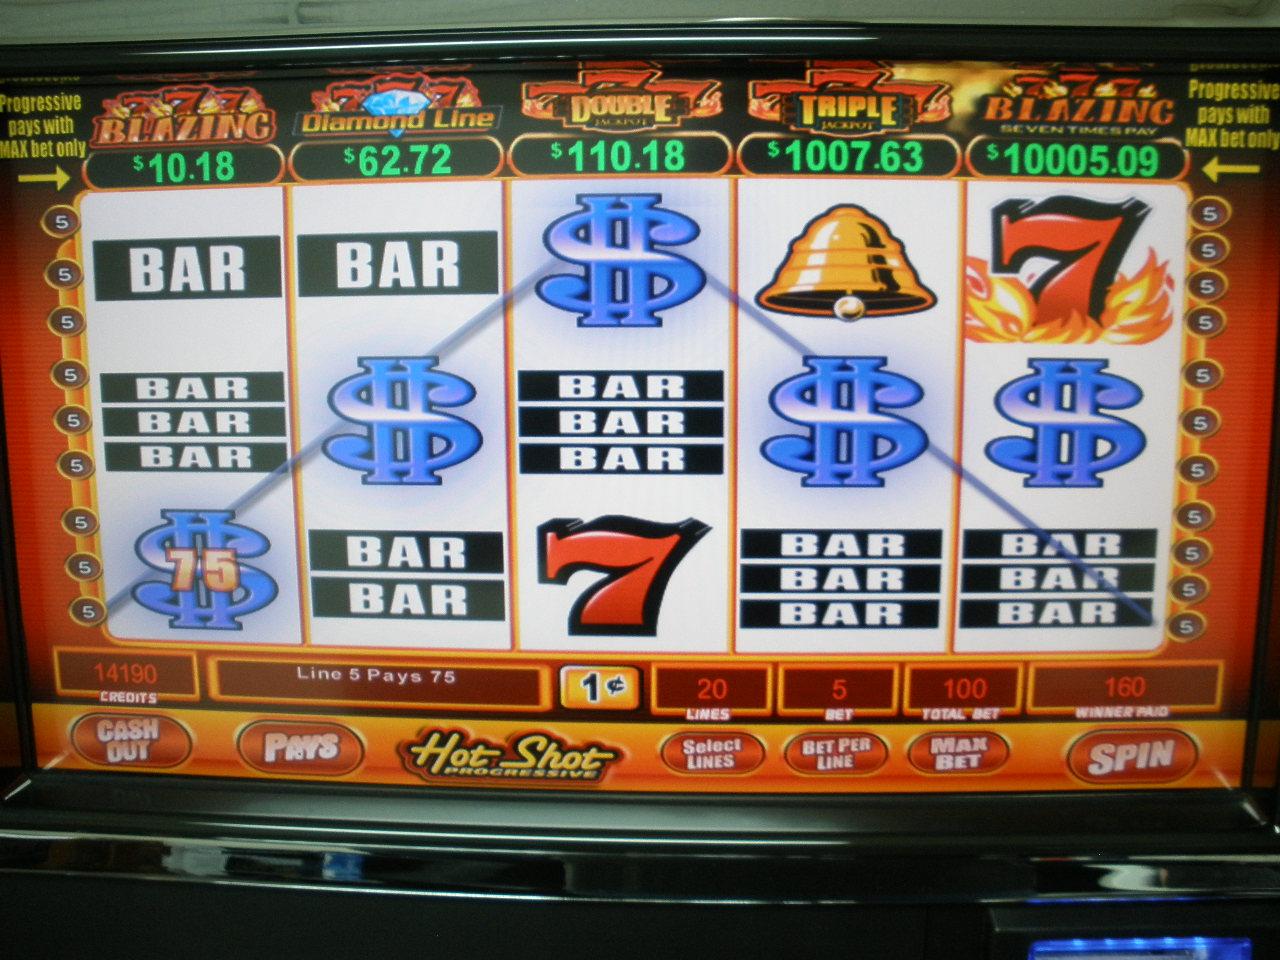 Bally video slot games for pc louisiana casinos laws